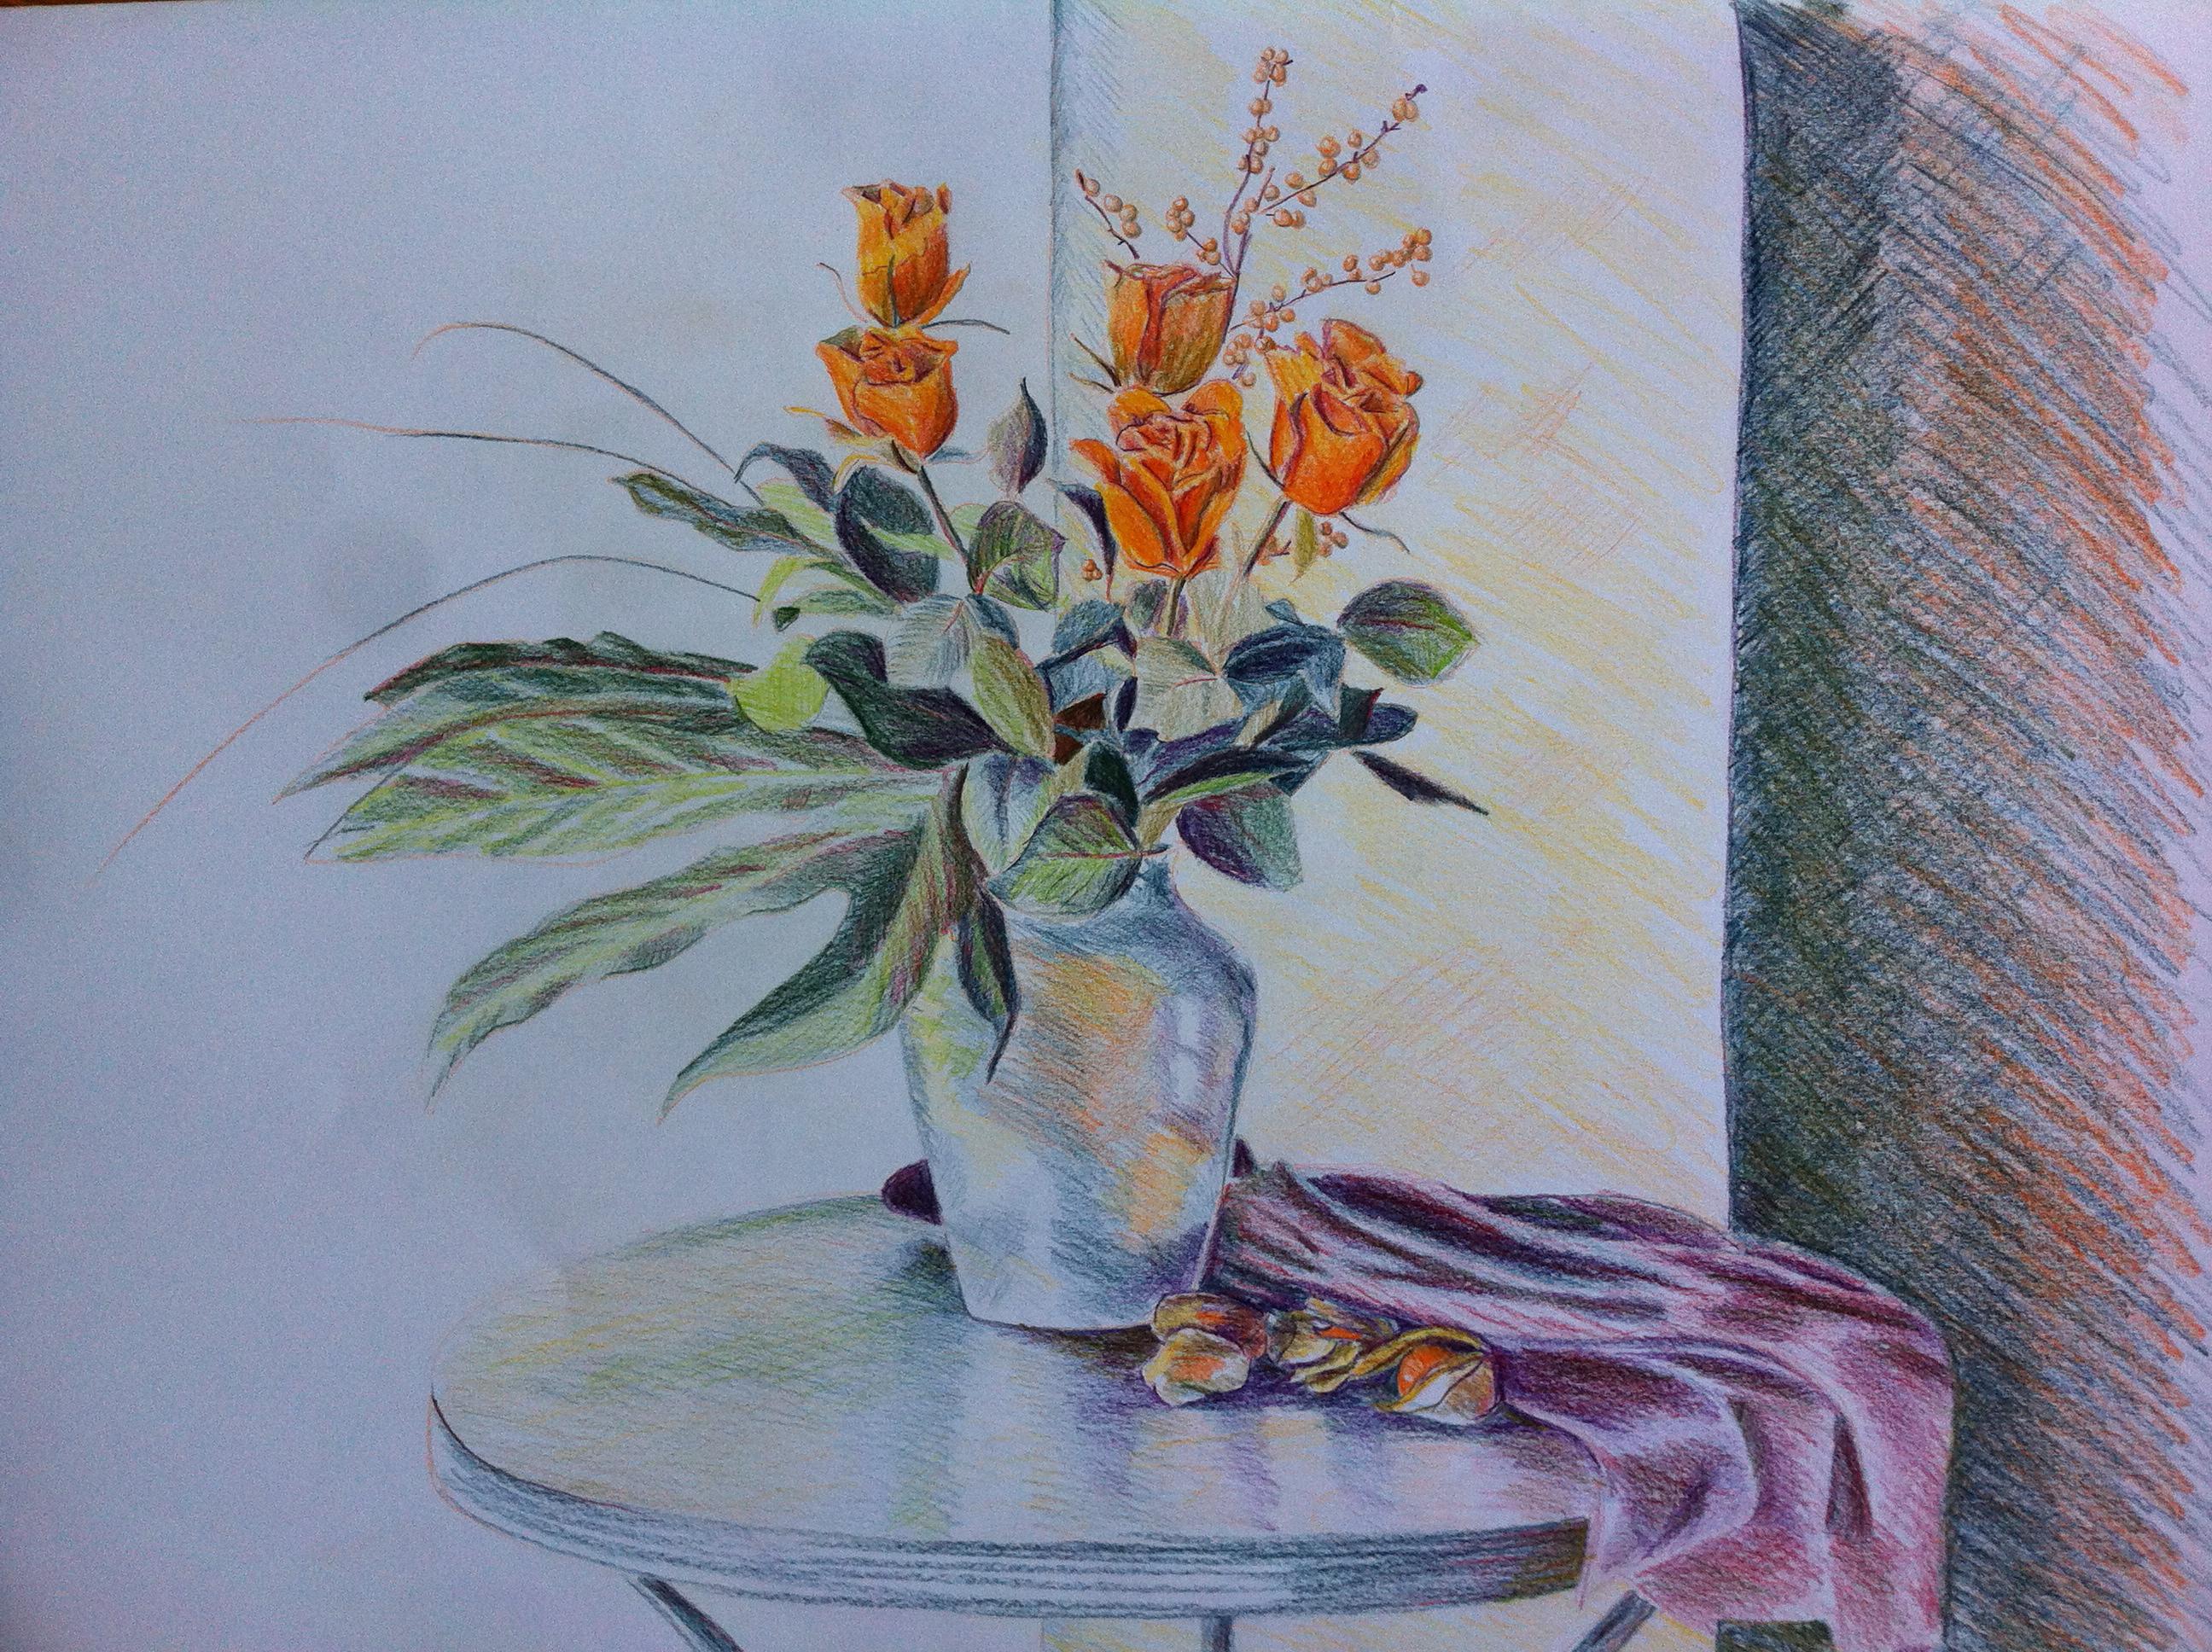 2592x1936 50 New Flower Vase Drawing